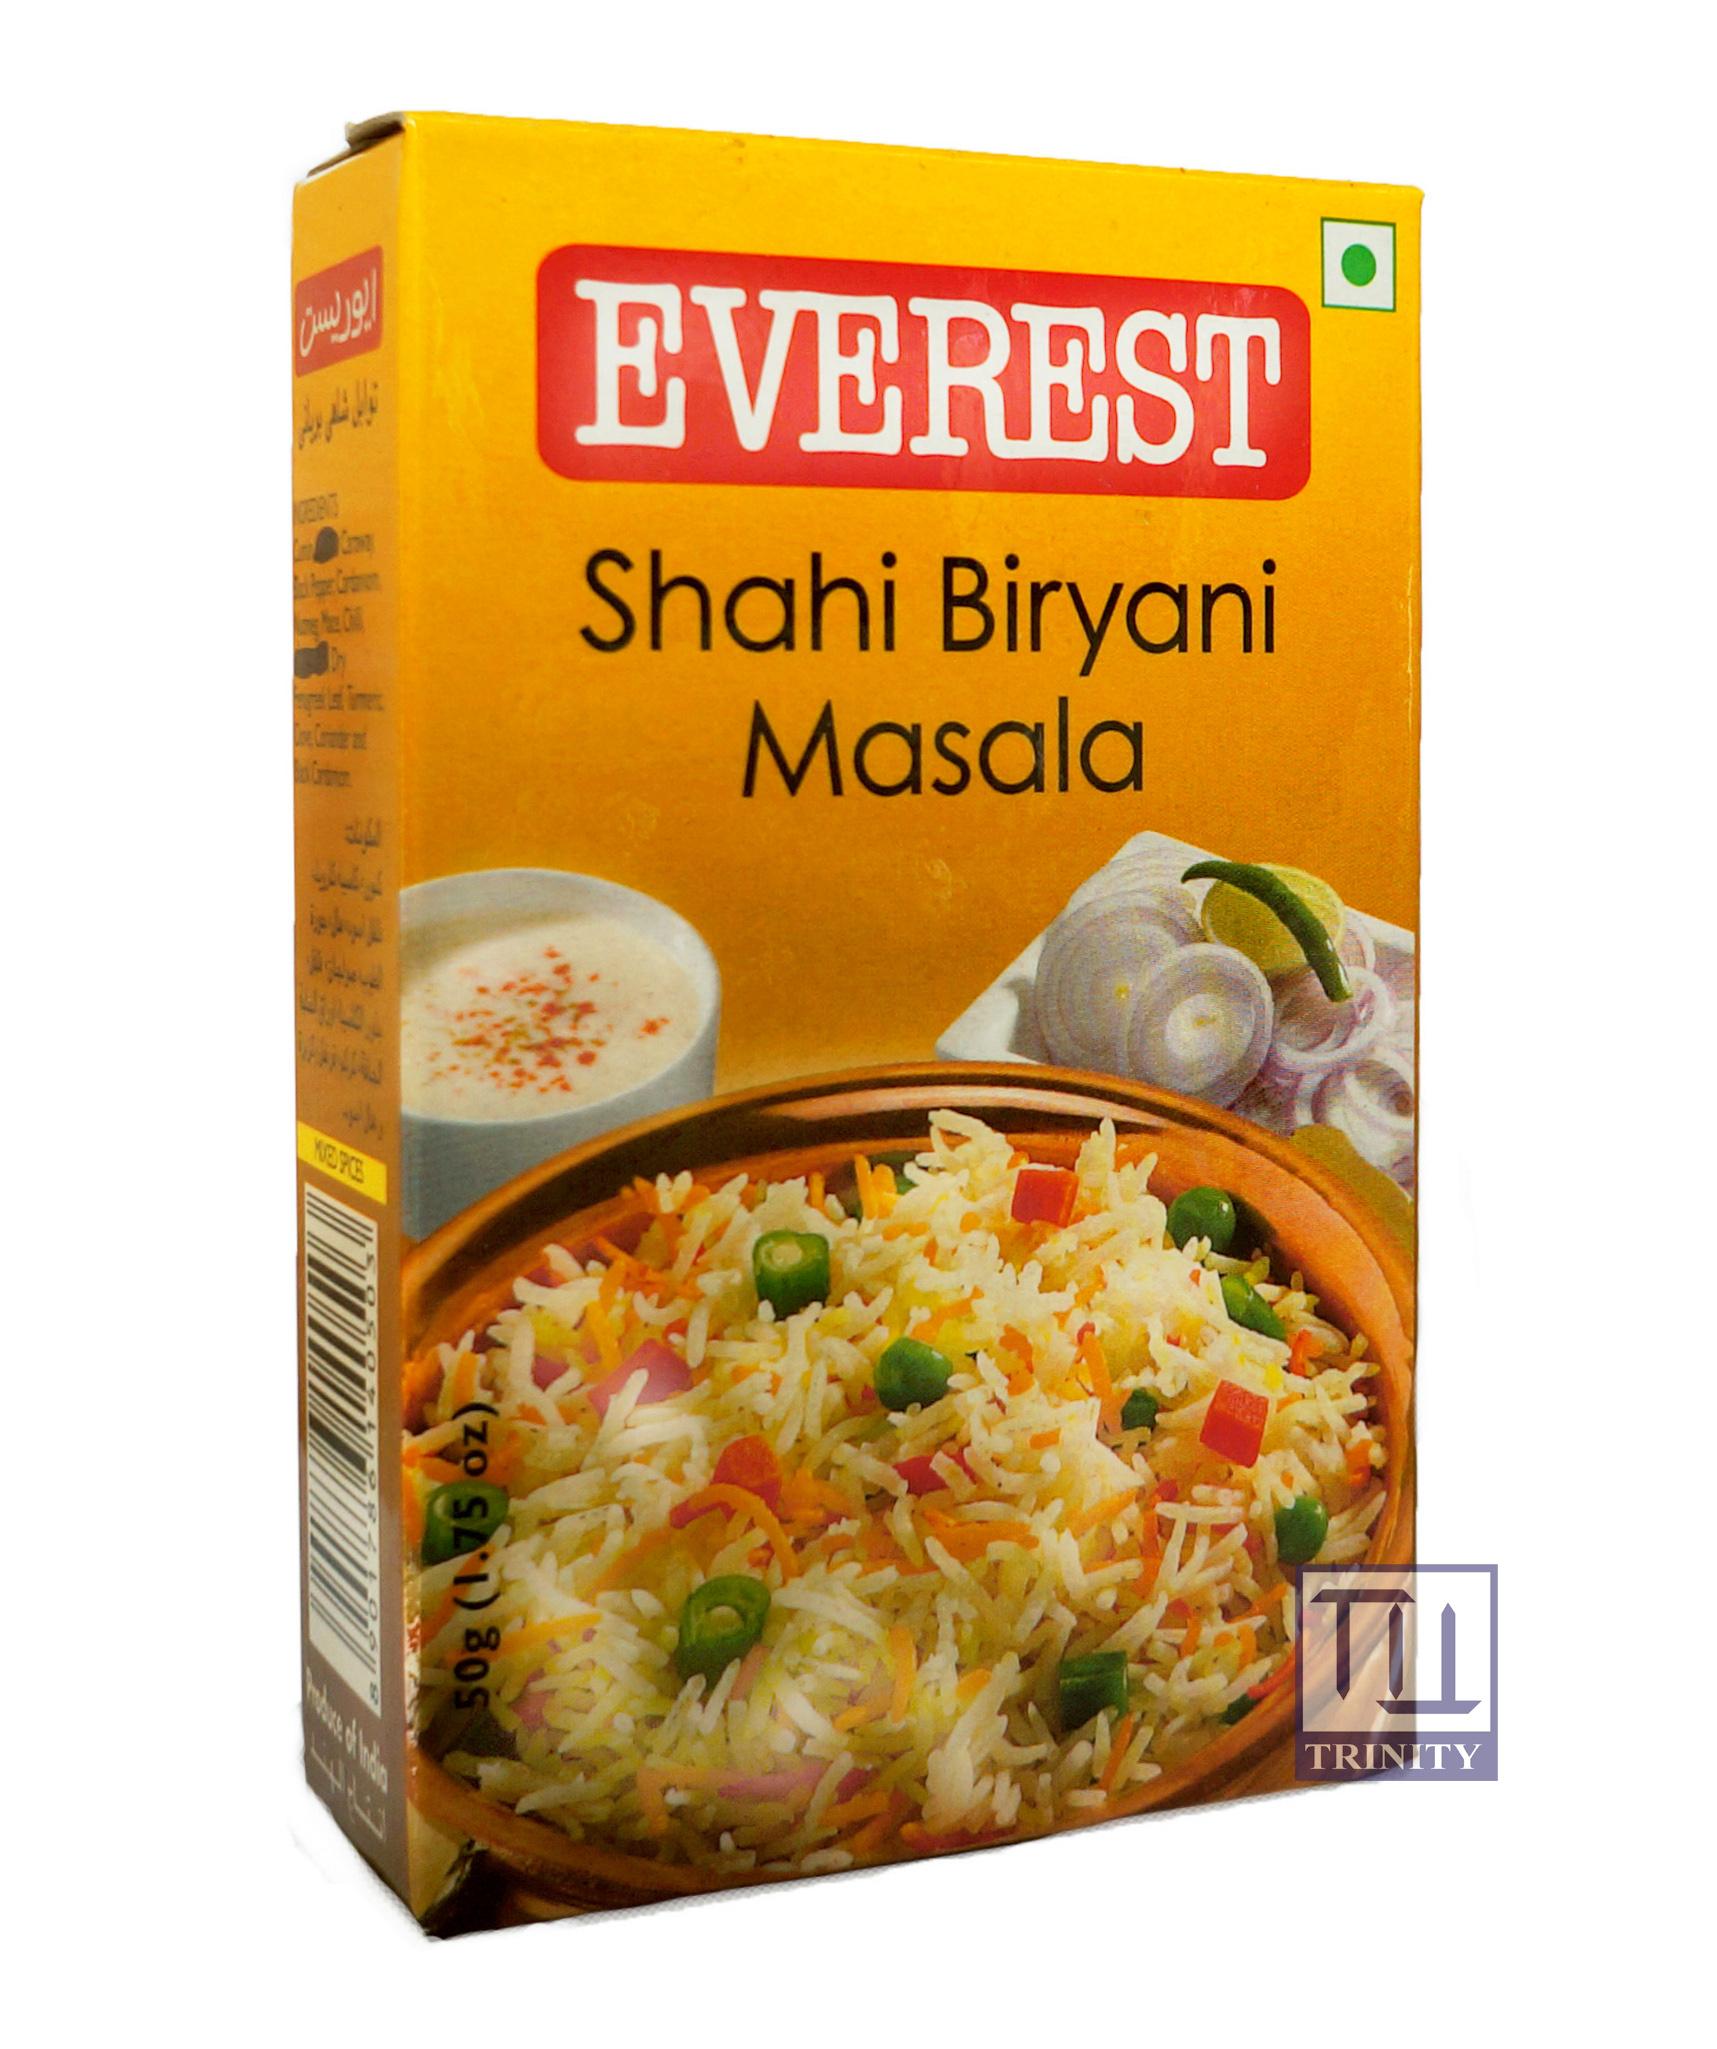 Everest Shahi Briyani Masala 印度香料粉 (煮燉飯用)